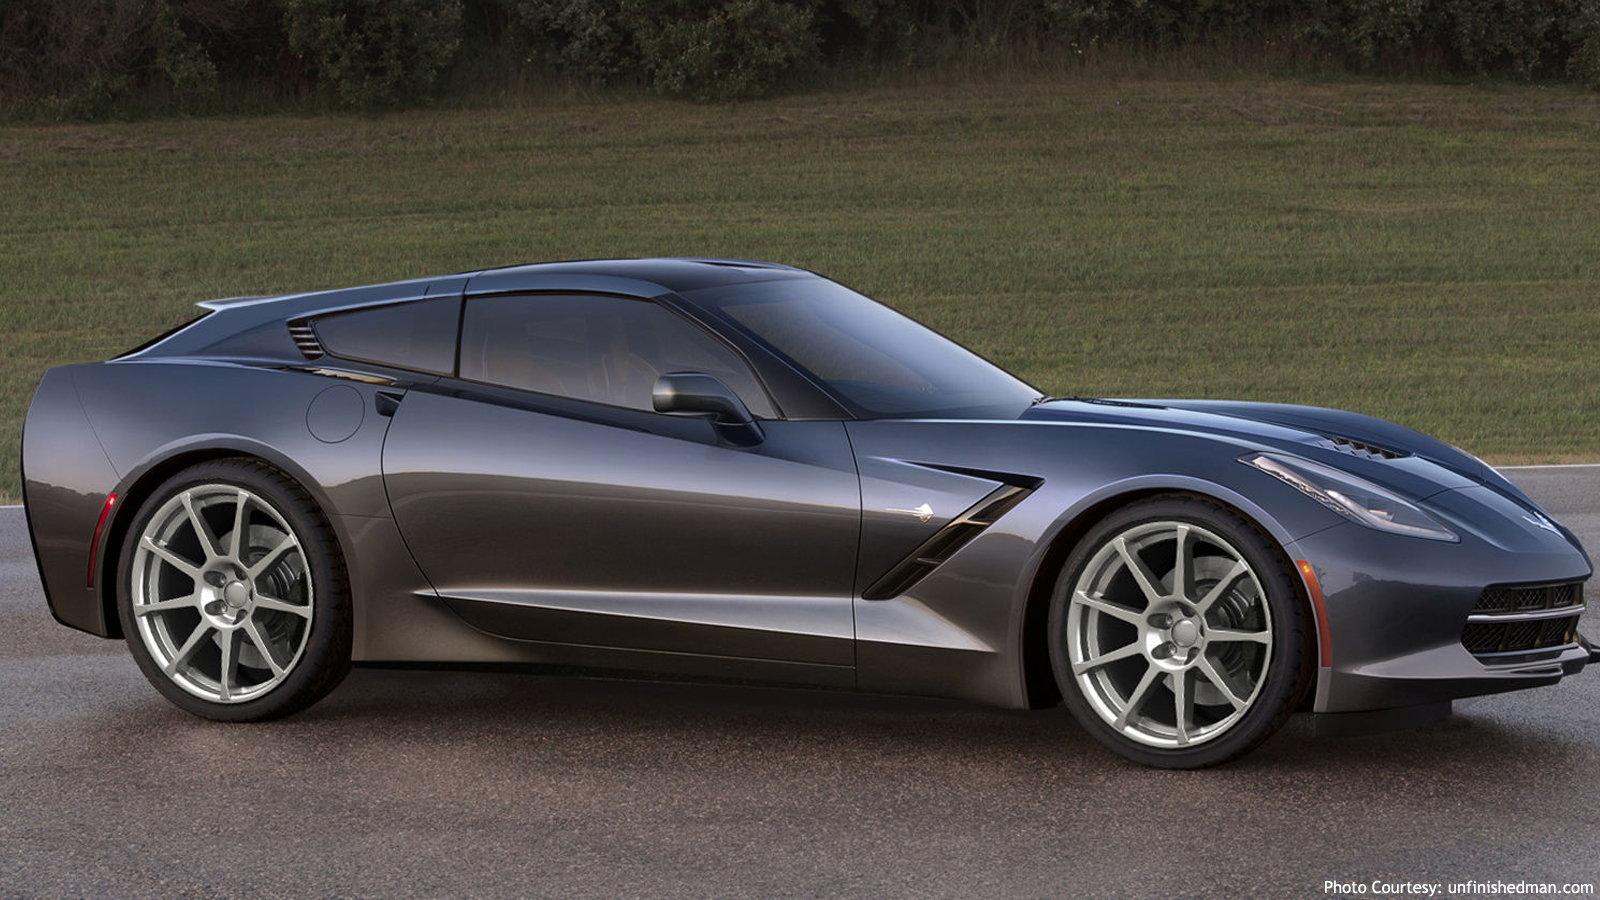 2016 Corvette Aerowagon